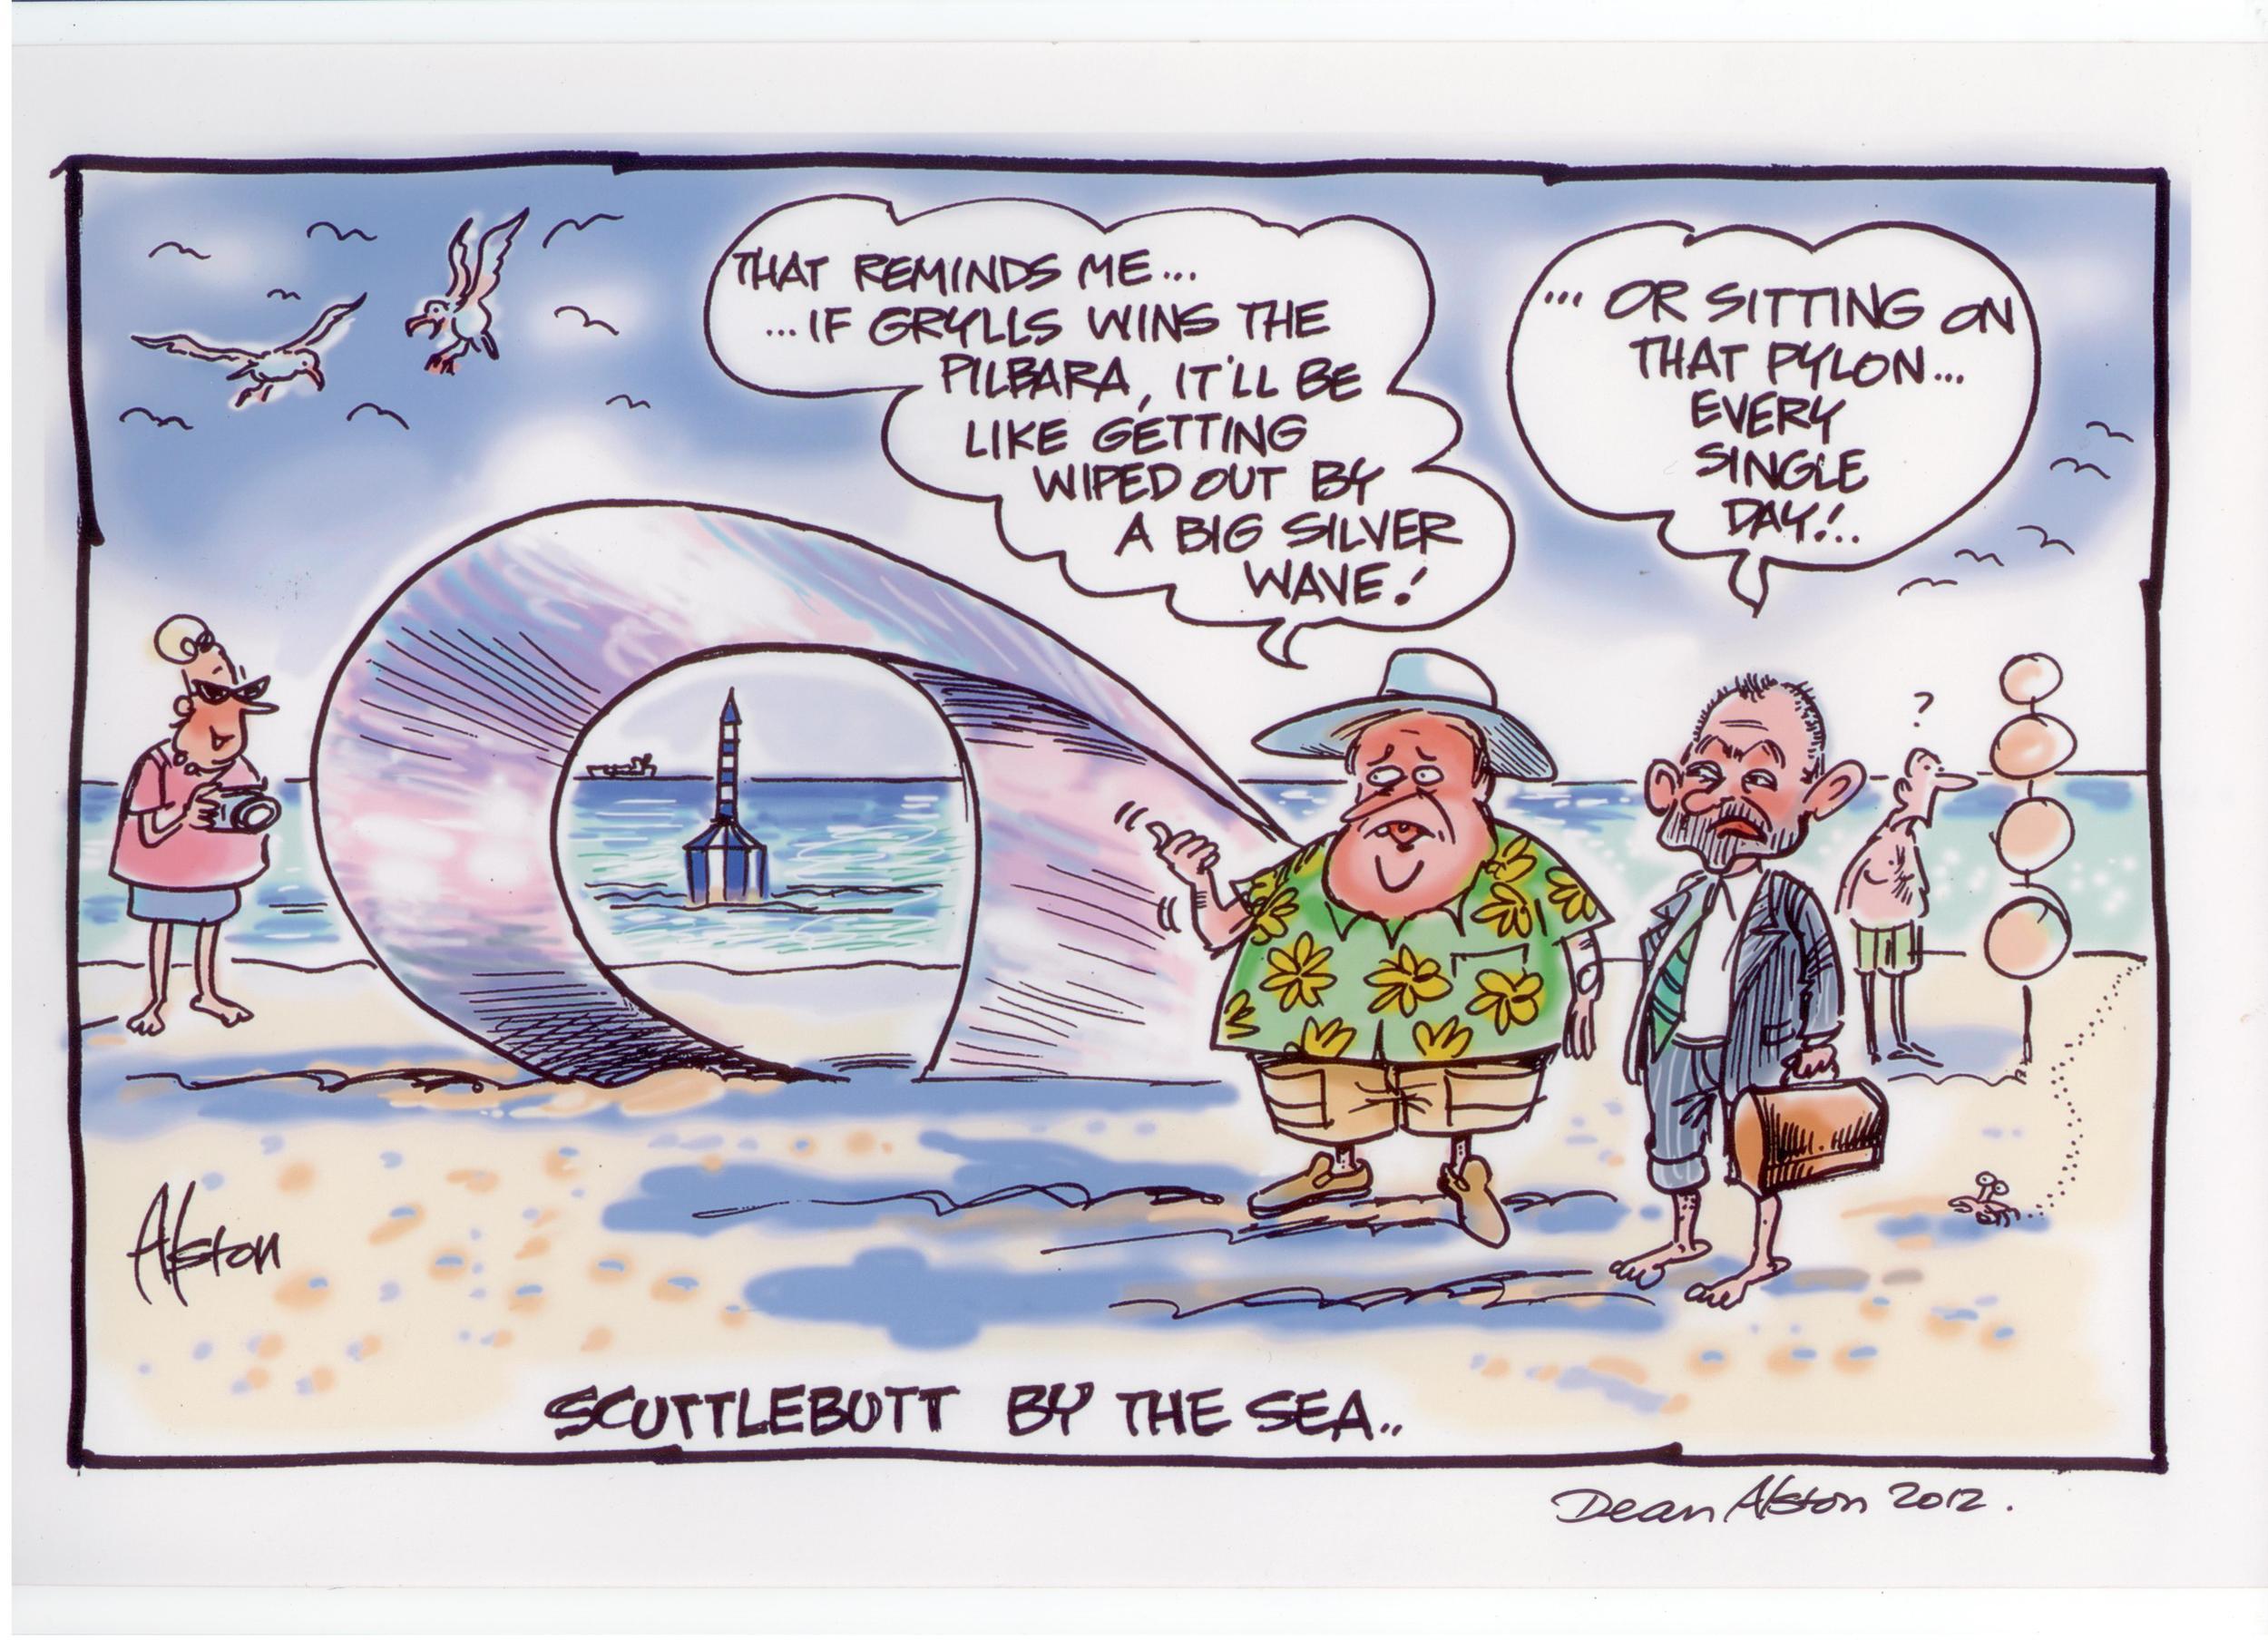 Dean Alston comic from the Western Australian newspaper